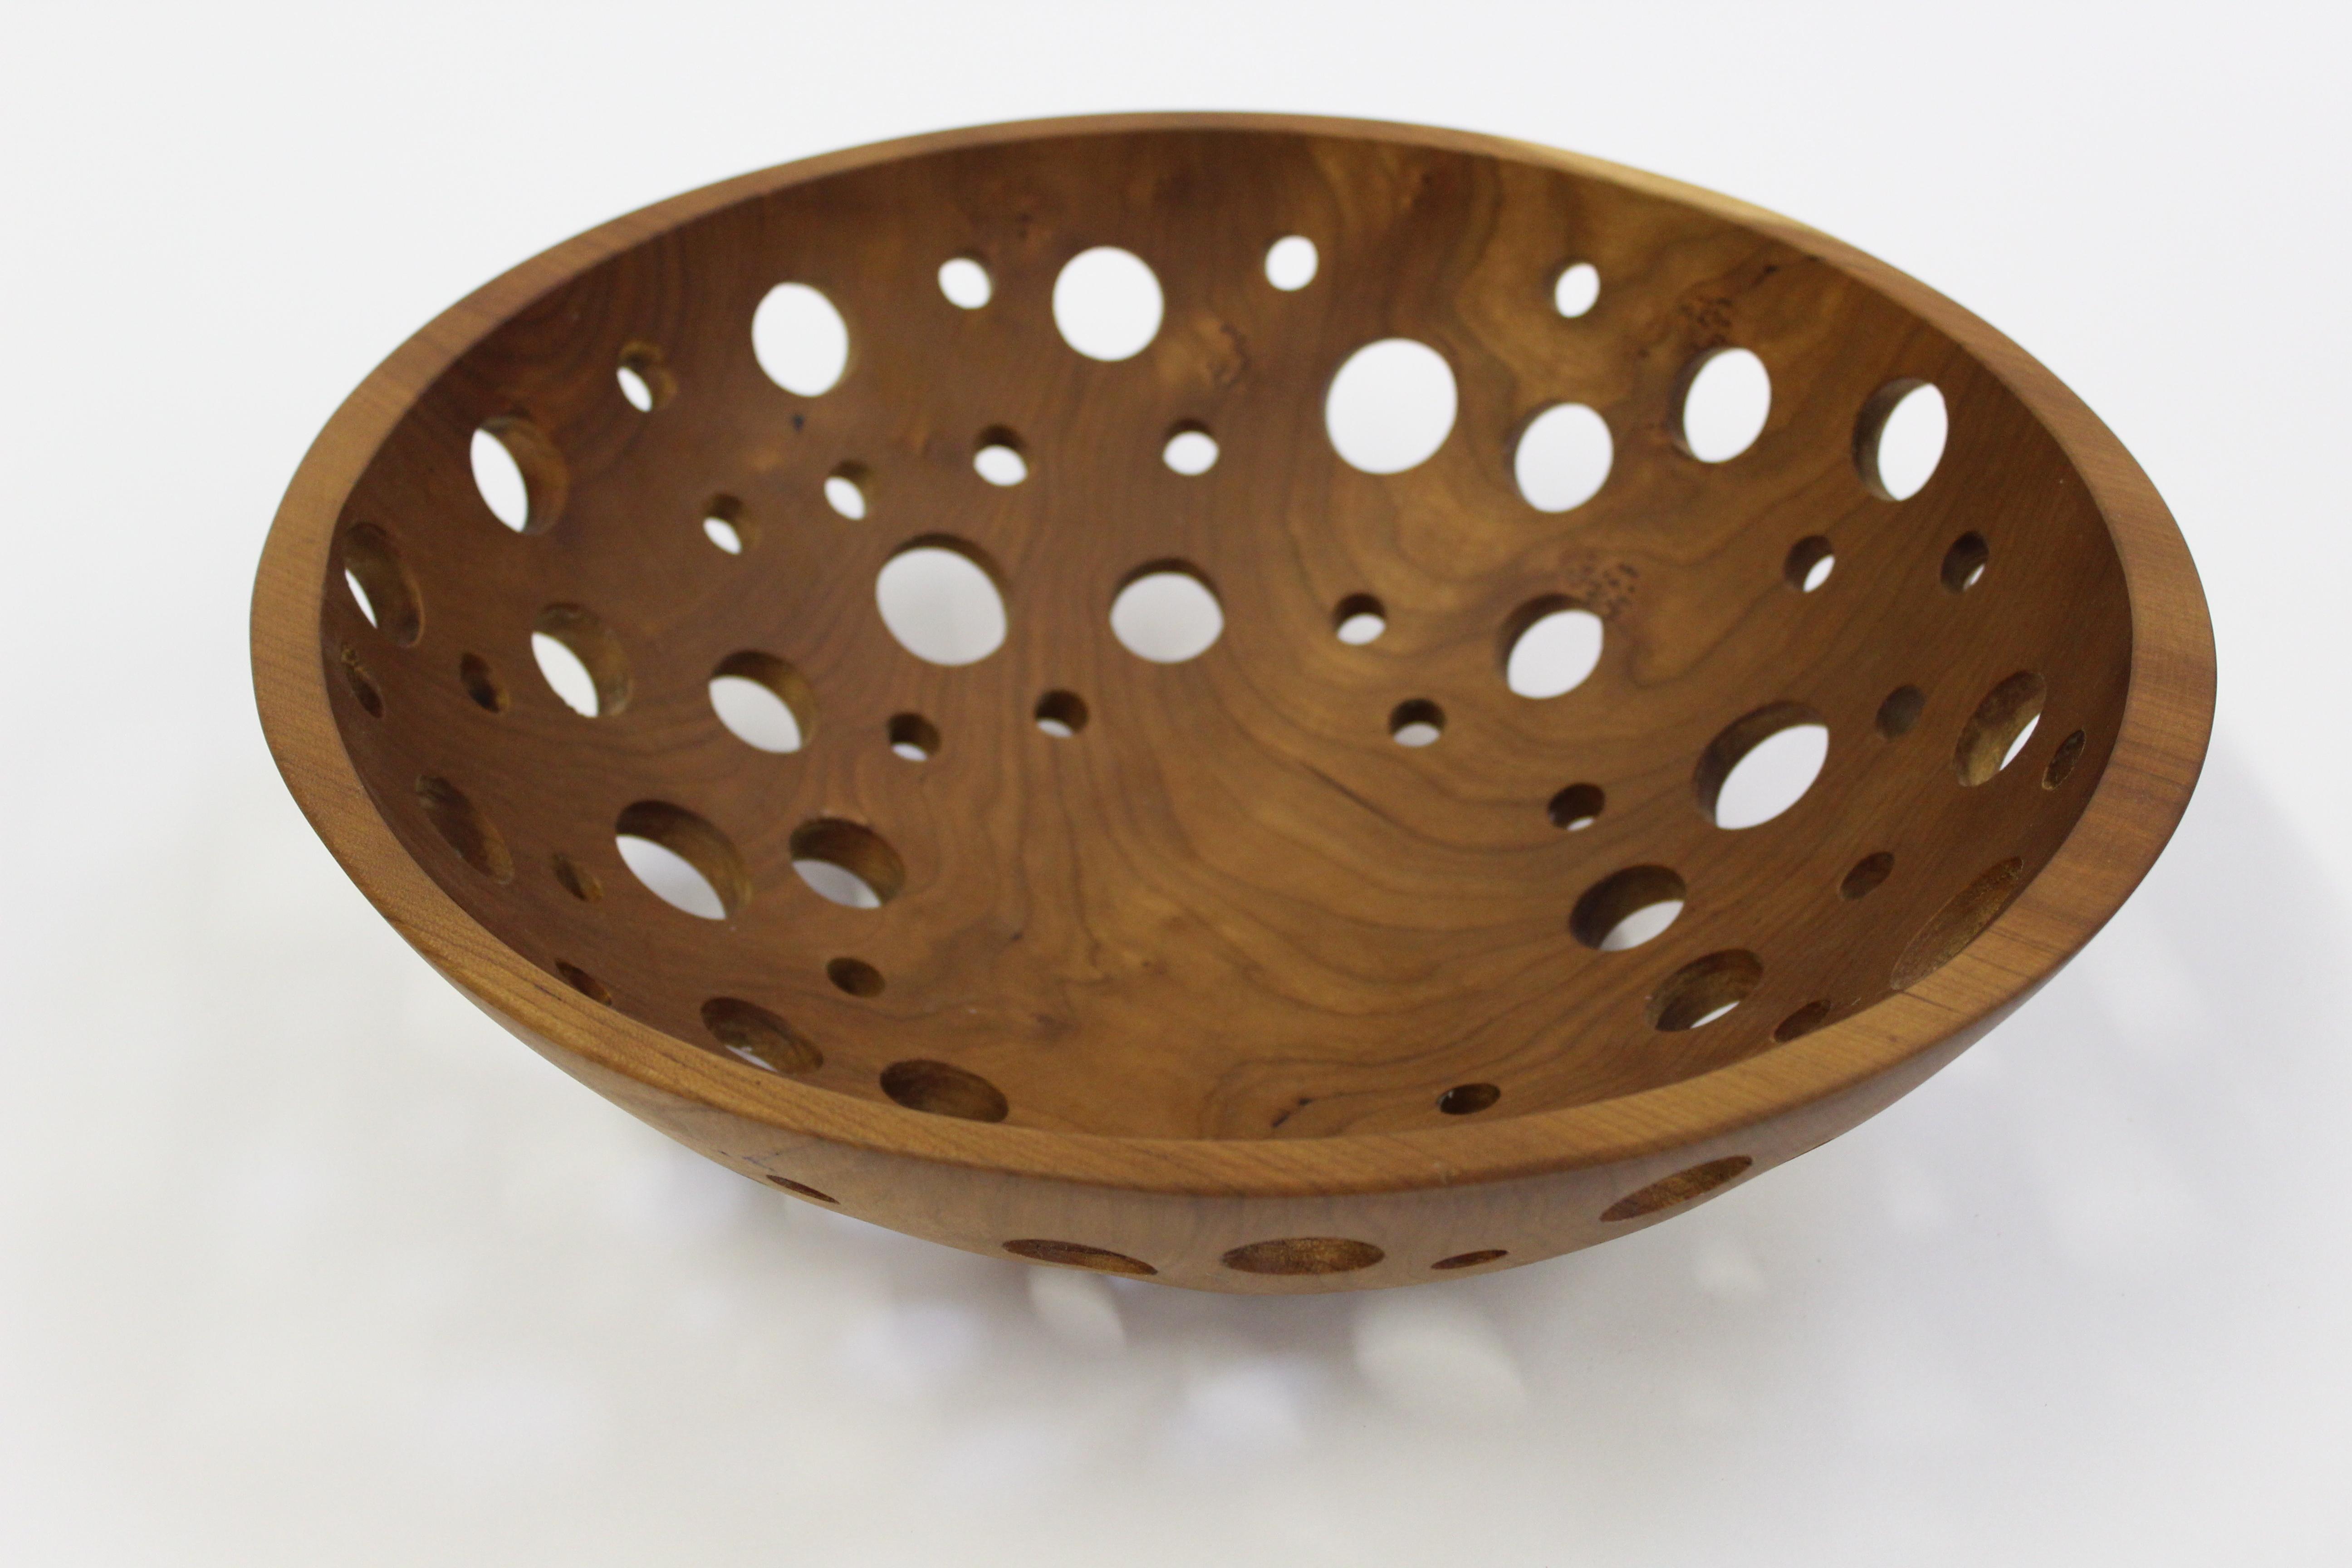 Decorative Wooden Fruit Bowls 15 Inch Cherry Fruit Bowl